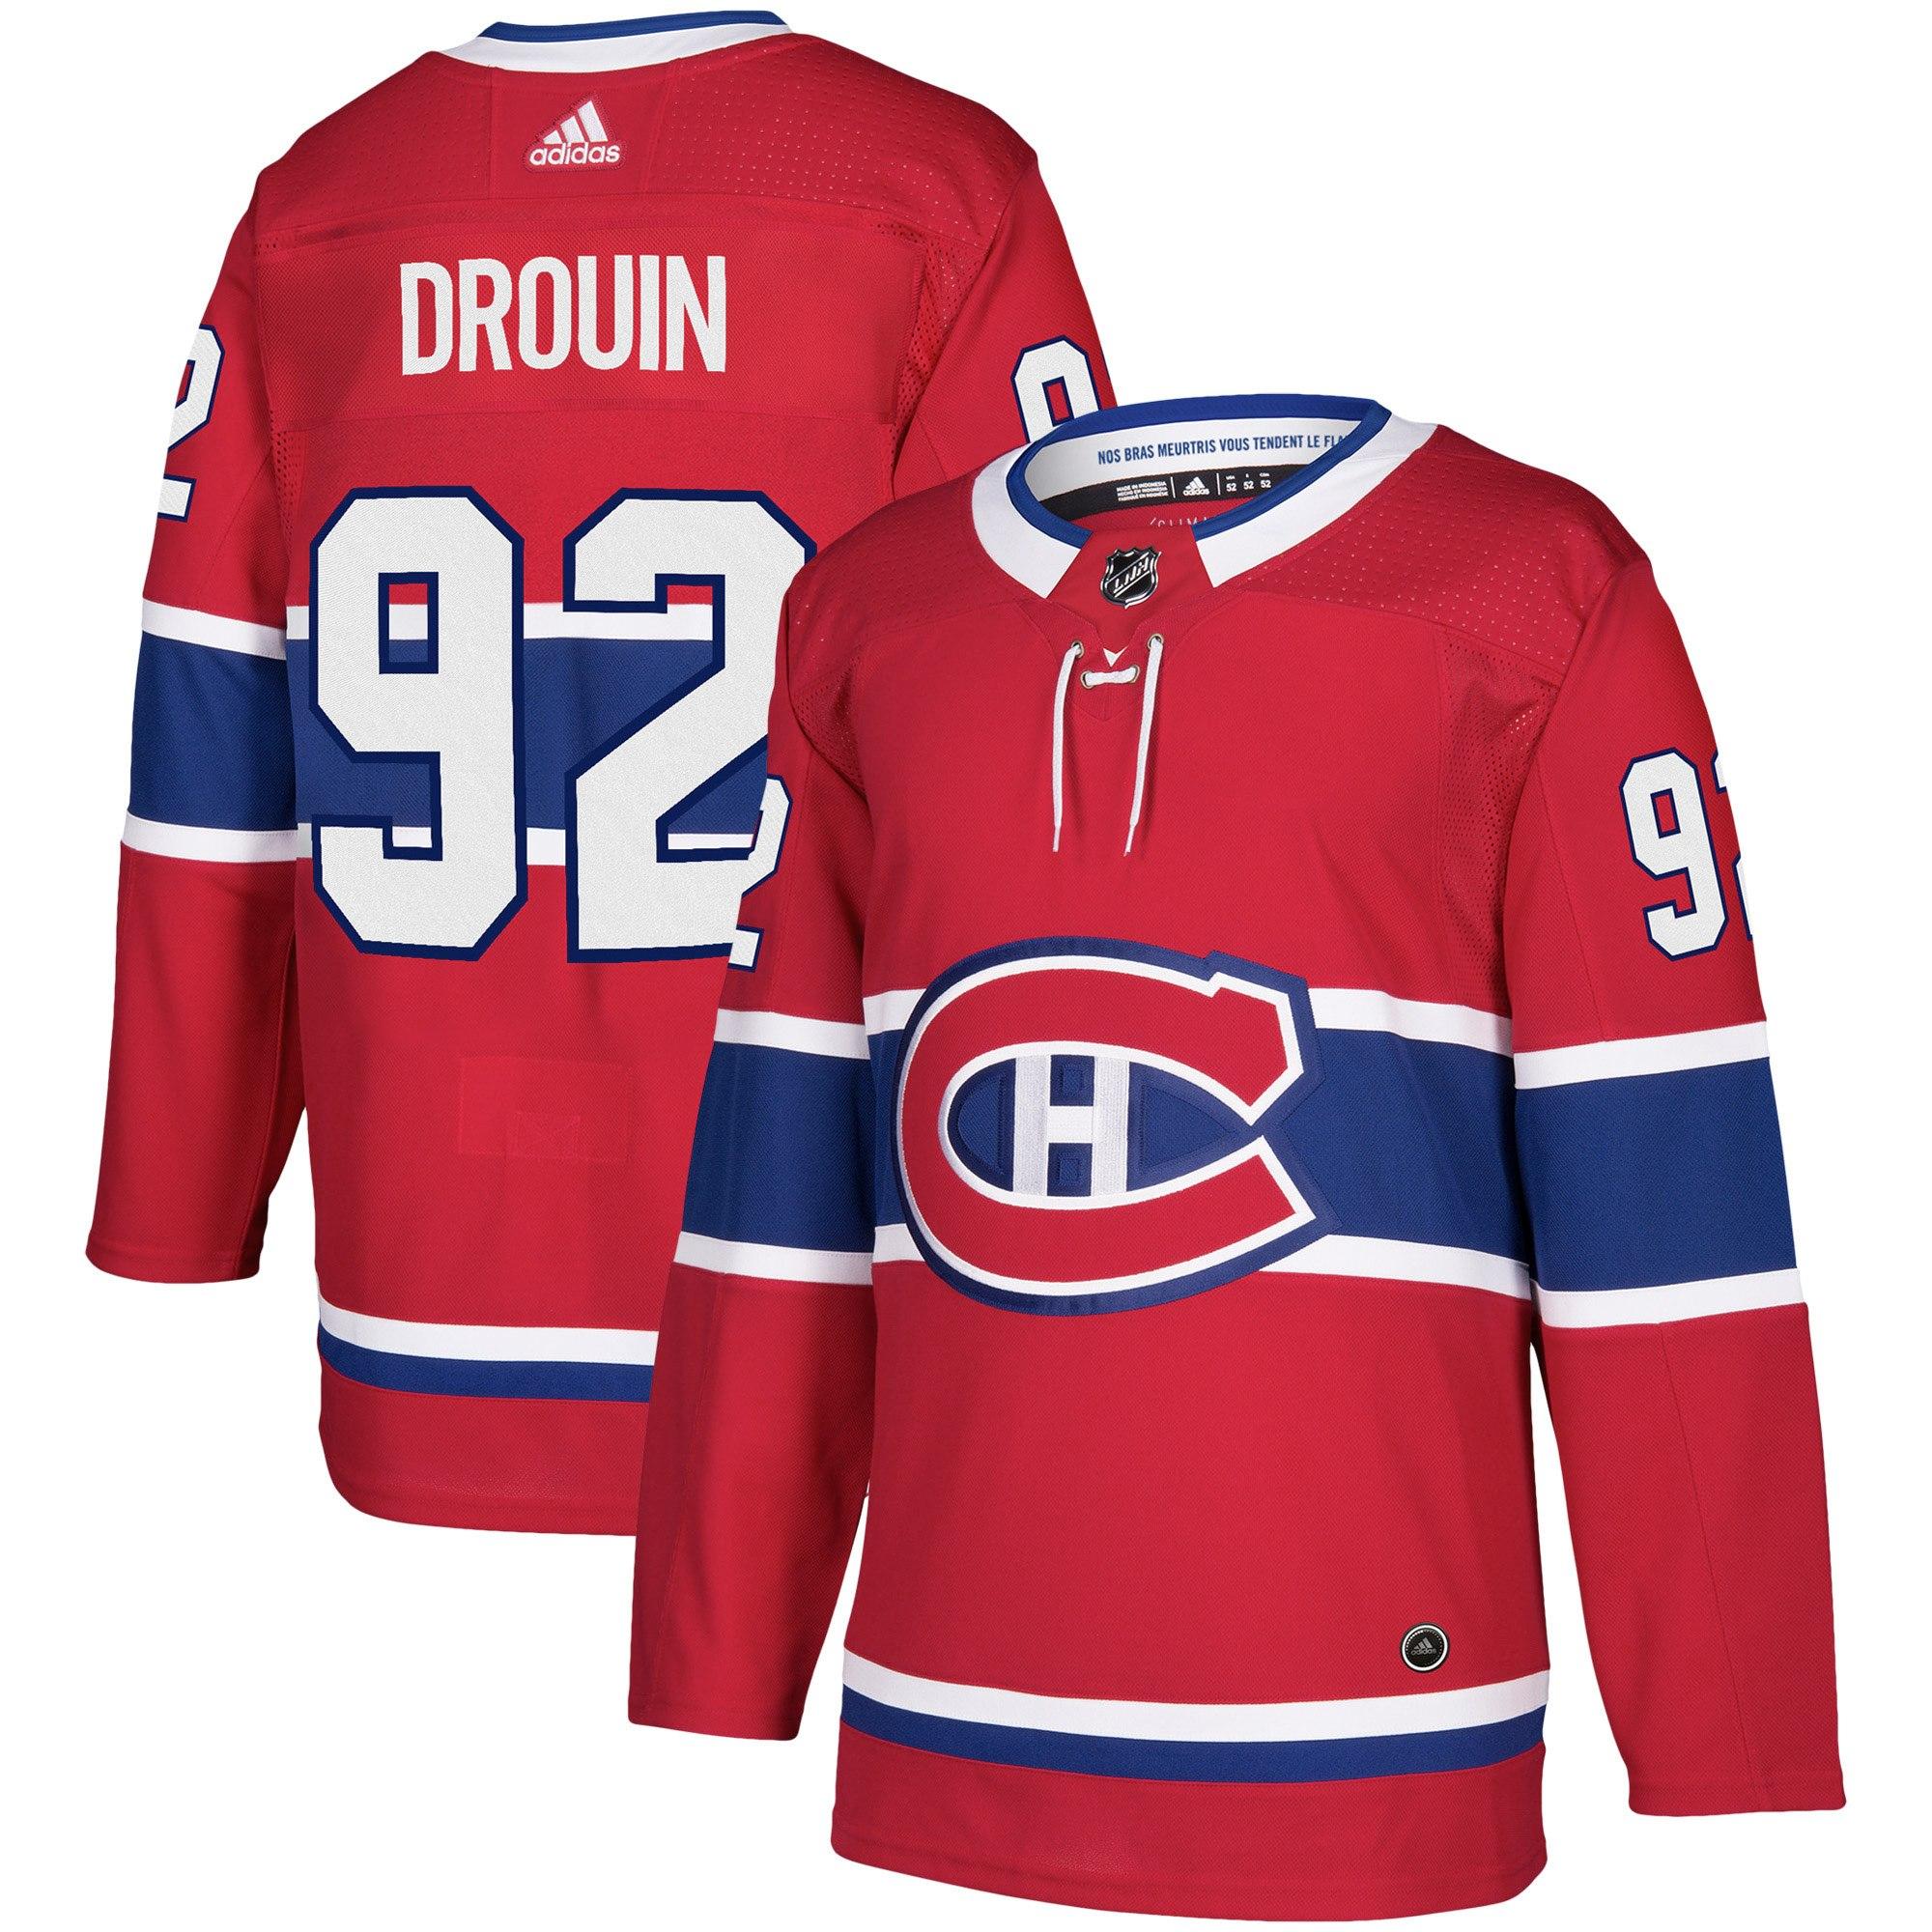 Adidas Dres Montreal Canadiens #92 Jonathan Drouin adizero Home Authentic Player Pro Velikost: L, Distribuce: USA